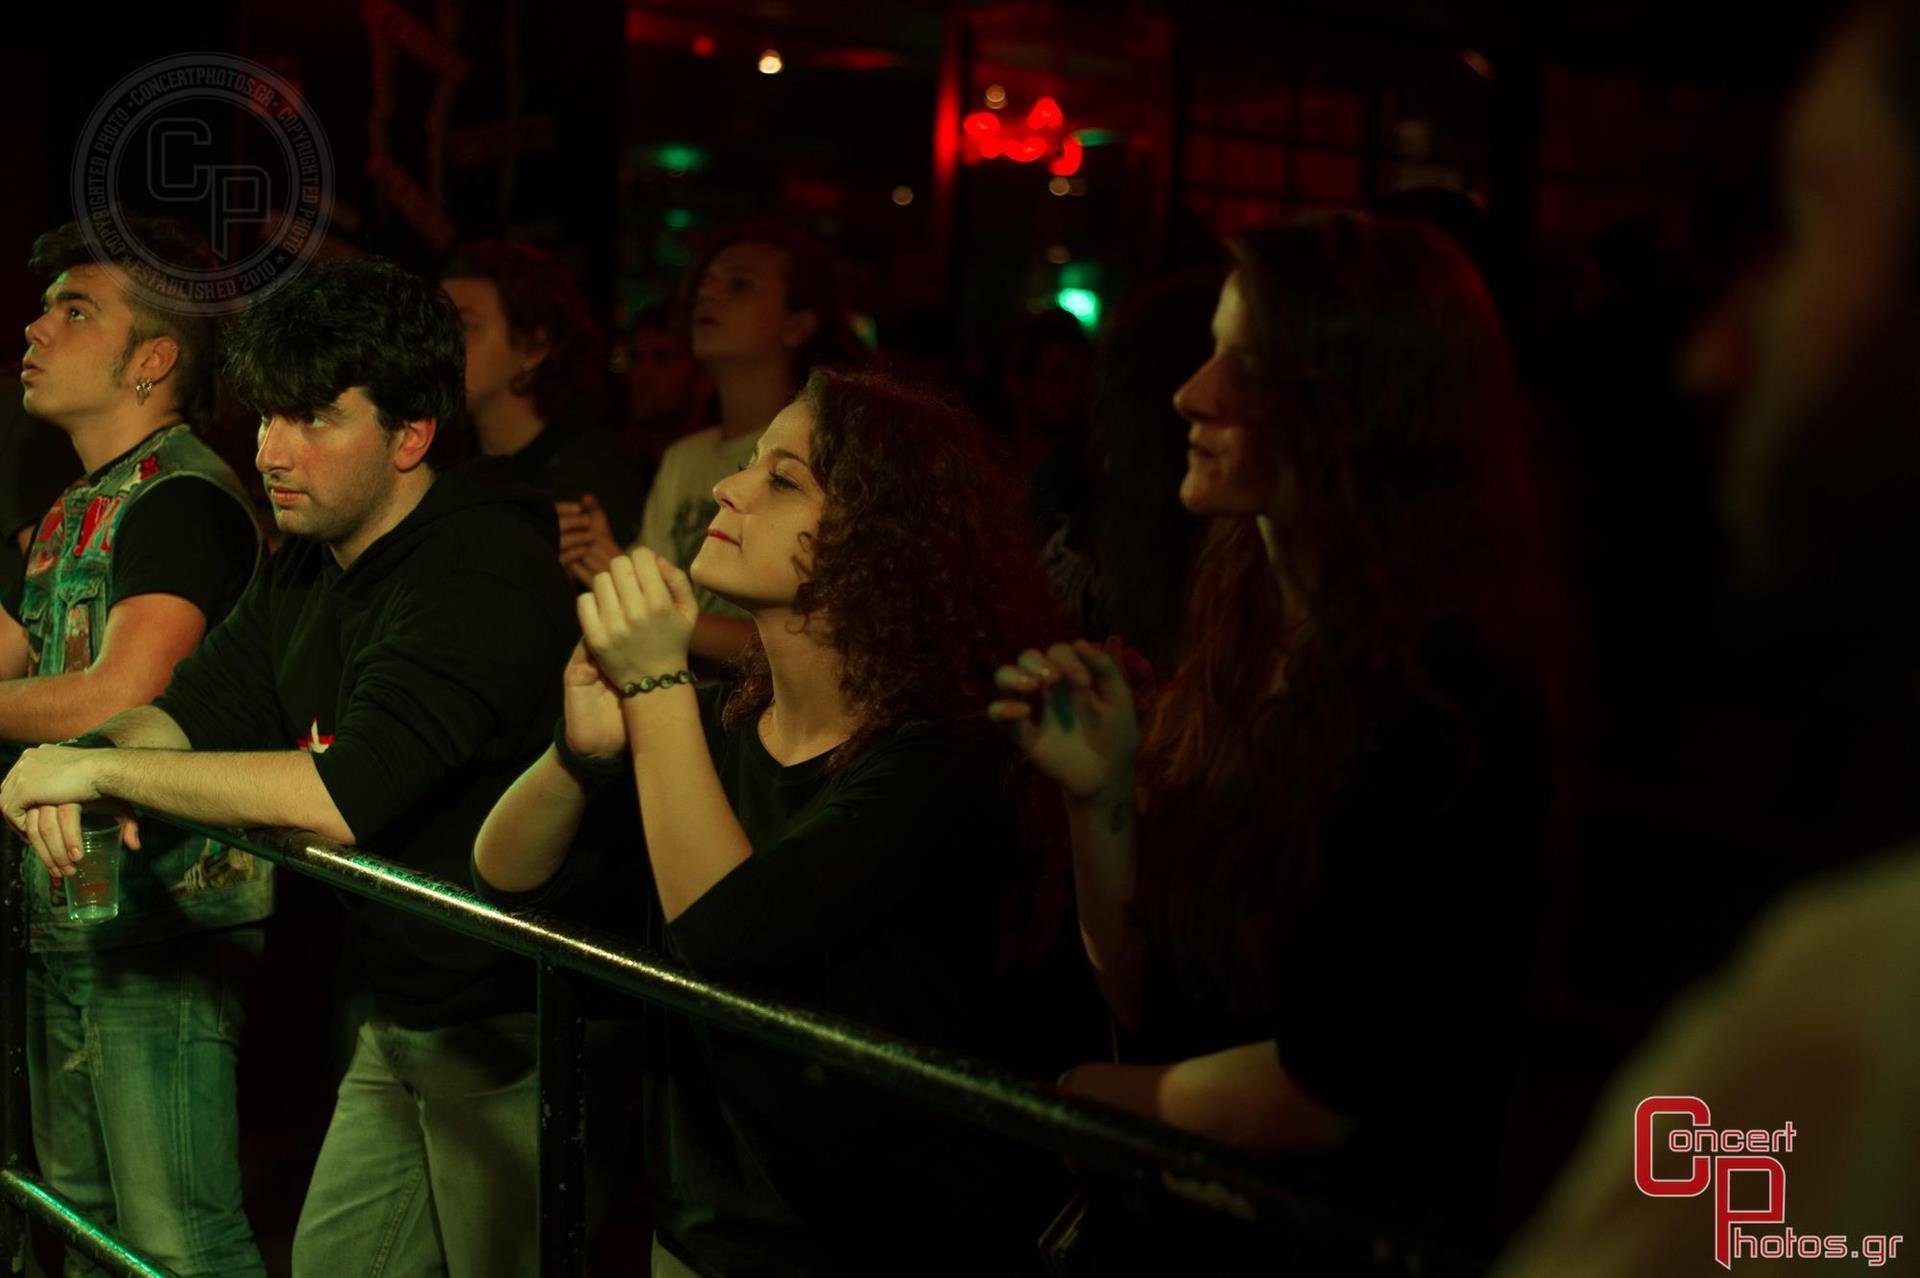 Battle Of The Bands Athens - Leg 3- photographer:  - ConcertPhotos - 20150104_2139_52